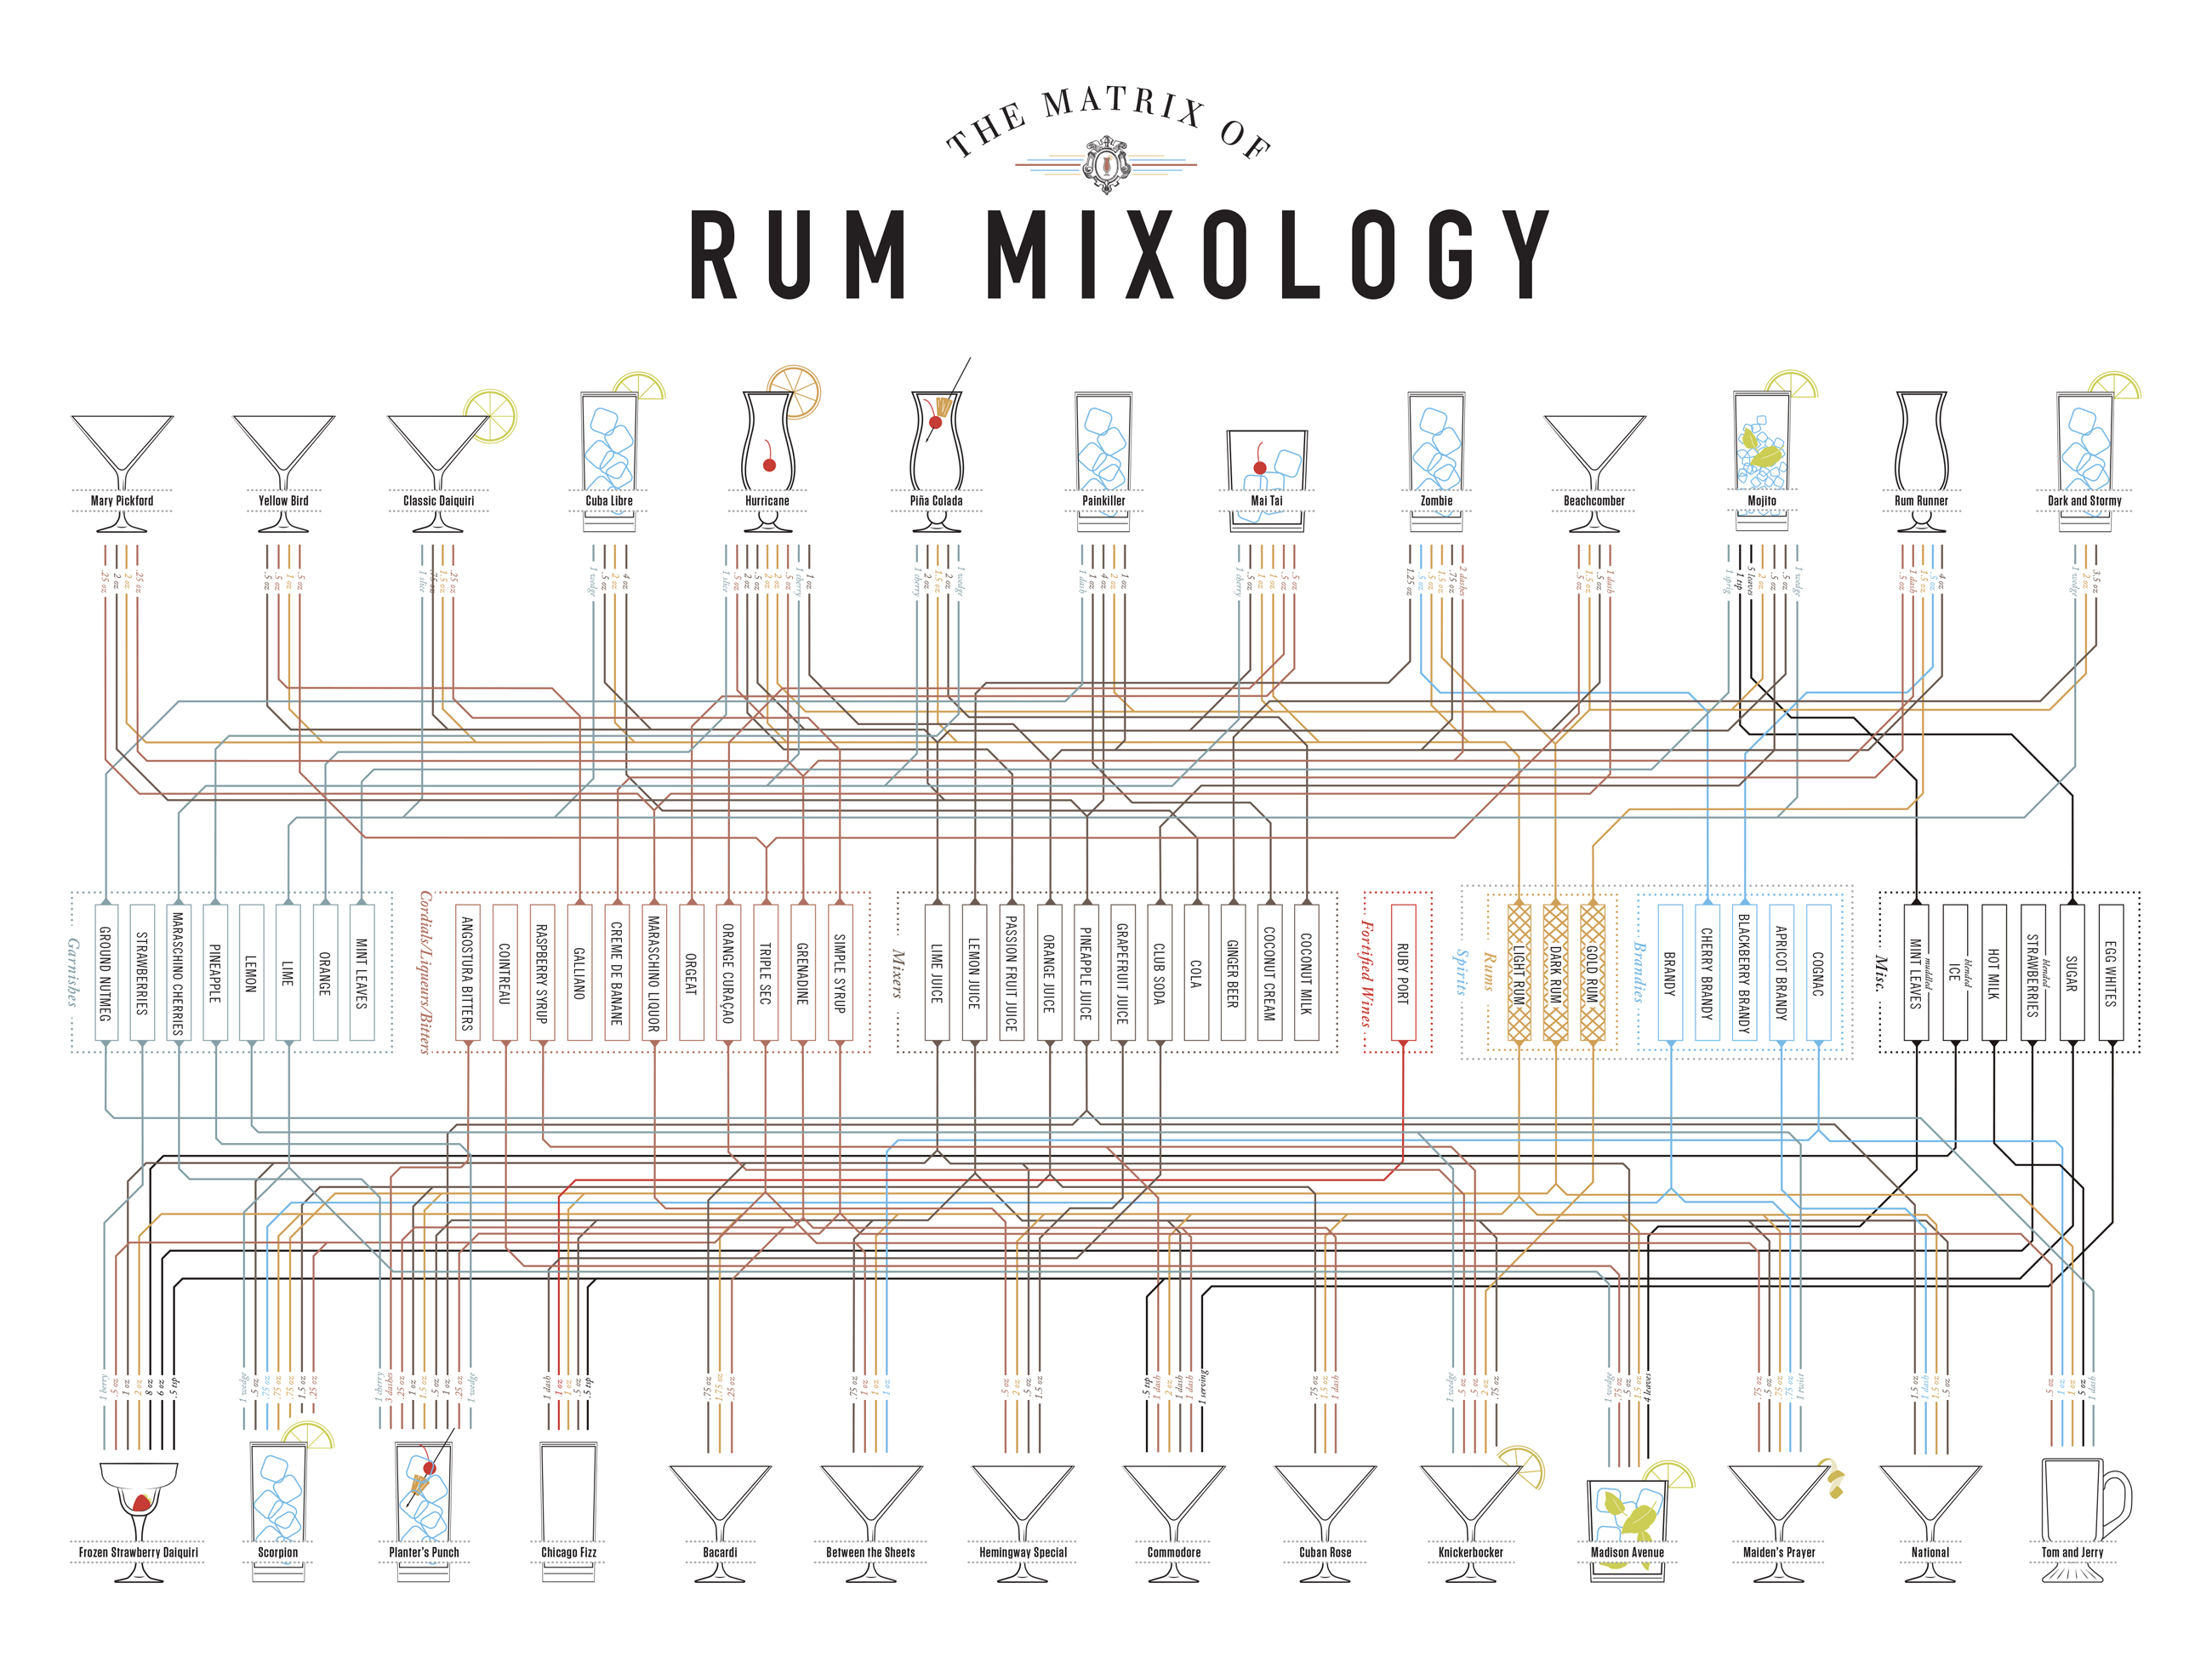 P-Mixology_Rum_Zoom_c4a9ebb8-4f34-429b-8c6f-436c677e46df